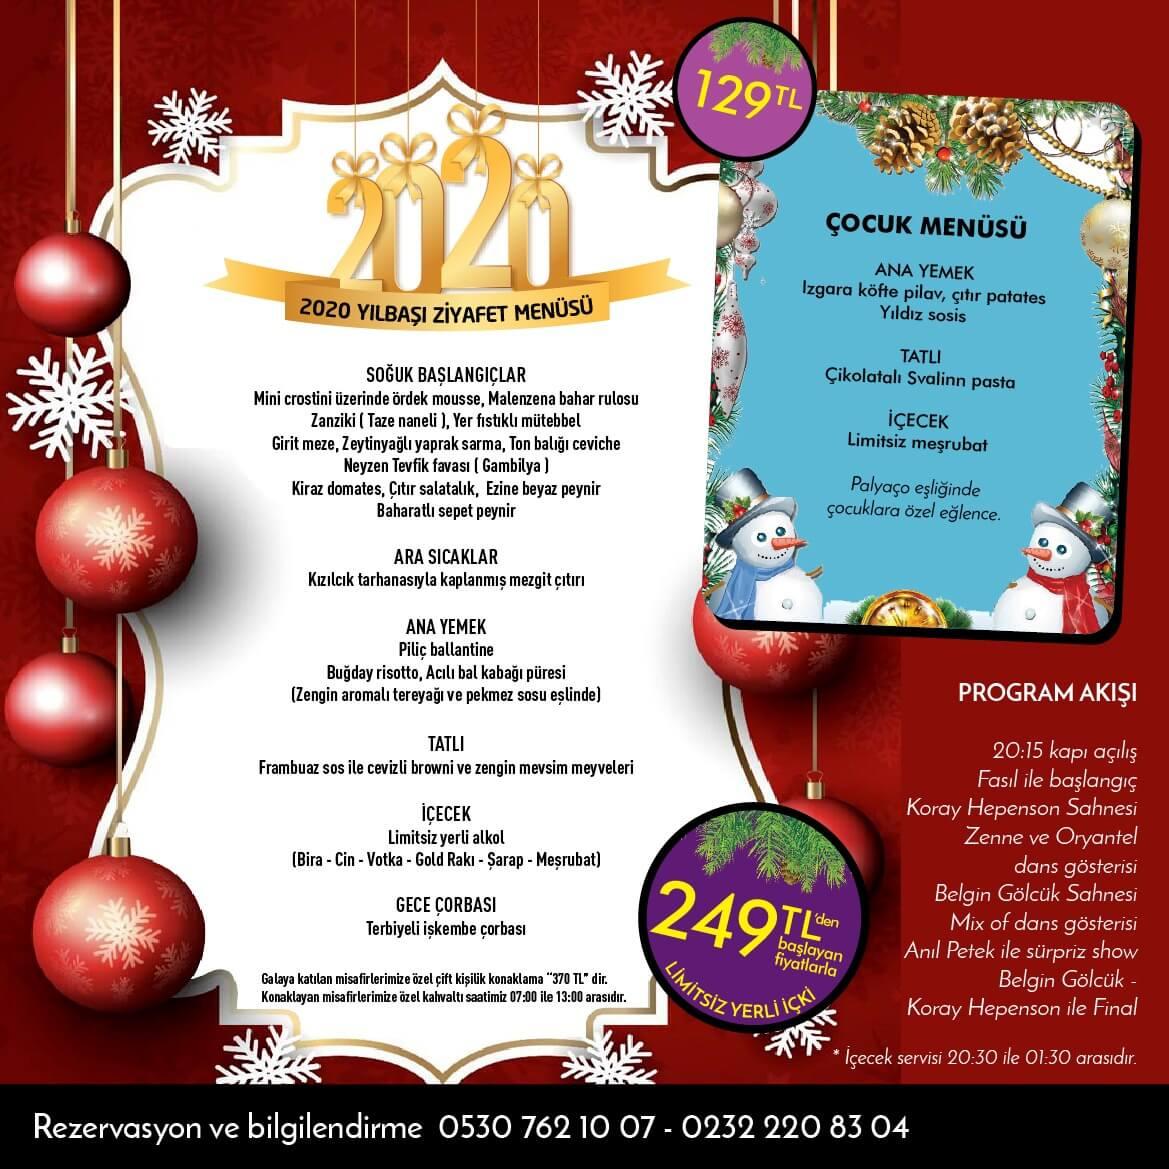 İzmir Svalinn Otel Yılbaşı Programı 2020